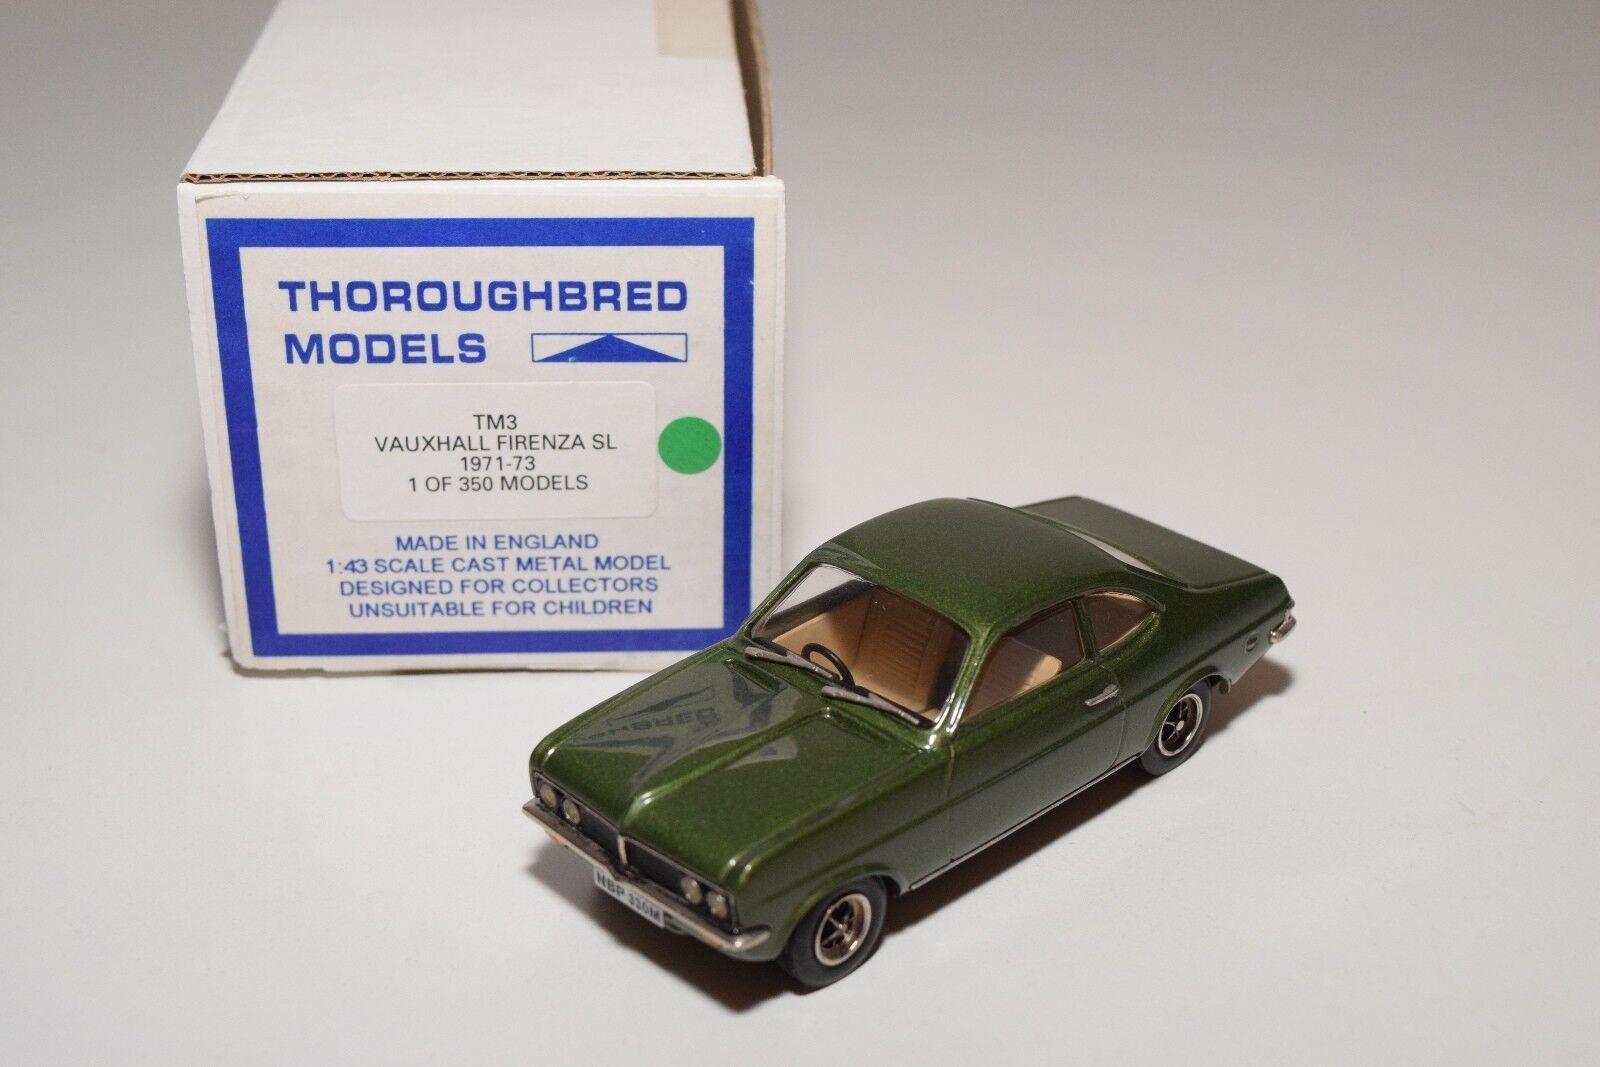 THgoldUGHBRED MODELS TM3 VAUXHALL FIRENZA SL 1971-73 MINT BOXED RARE   1 350